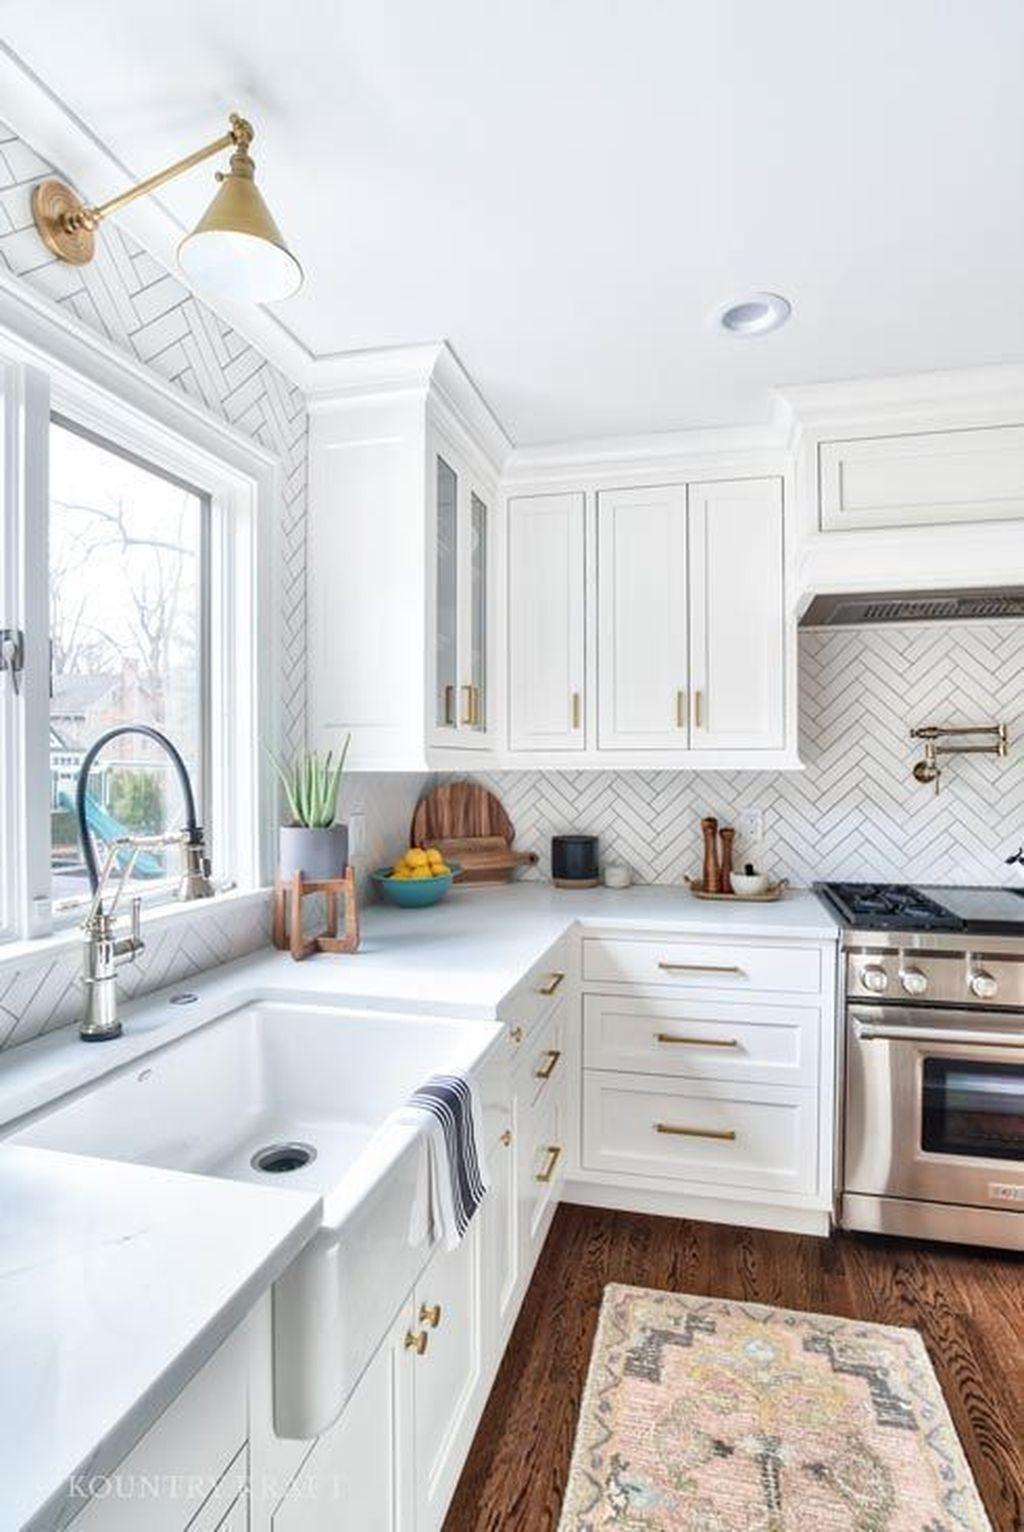 Brilliant Small Kitchen Remodel Design Ideas On A Budget 03